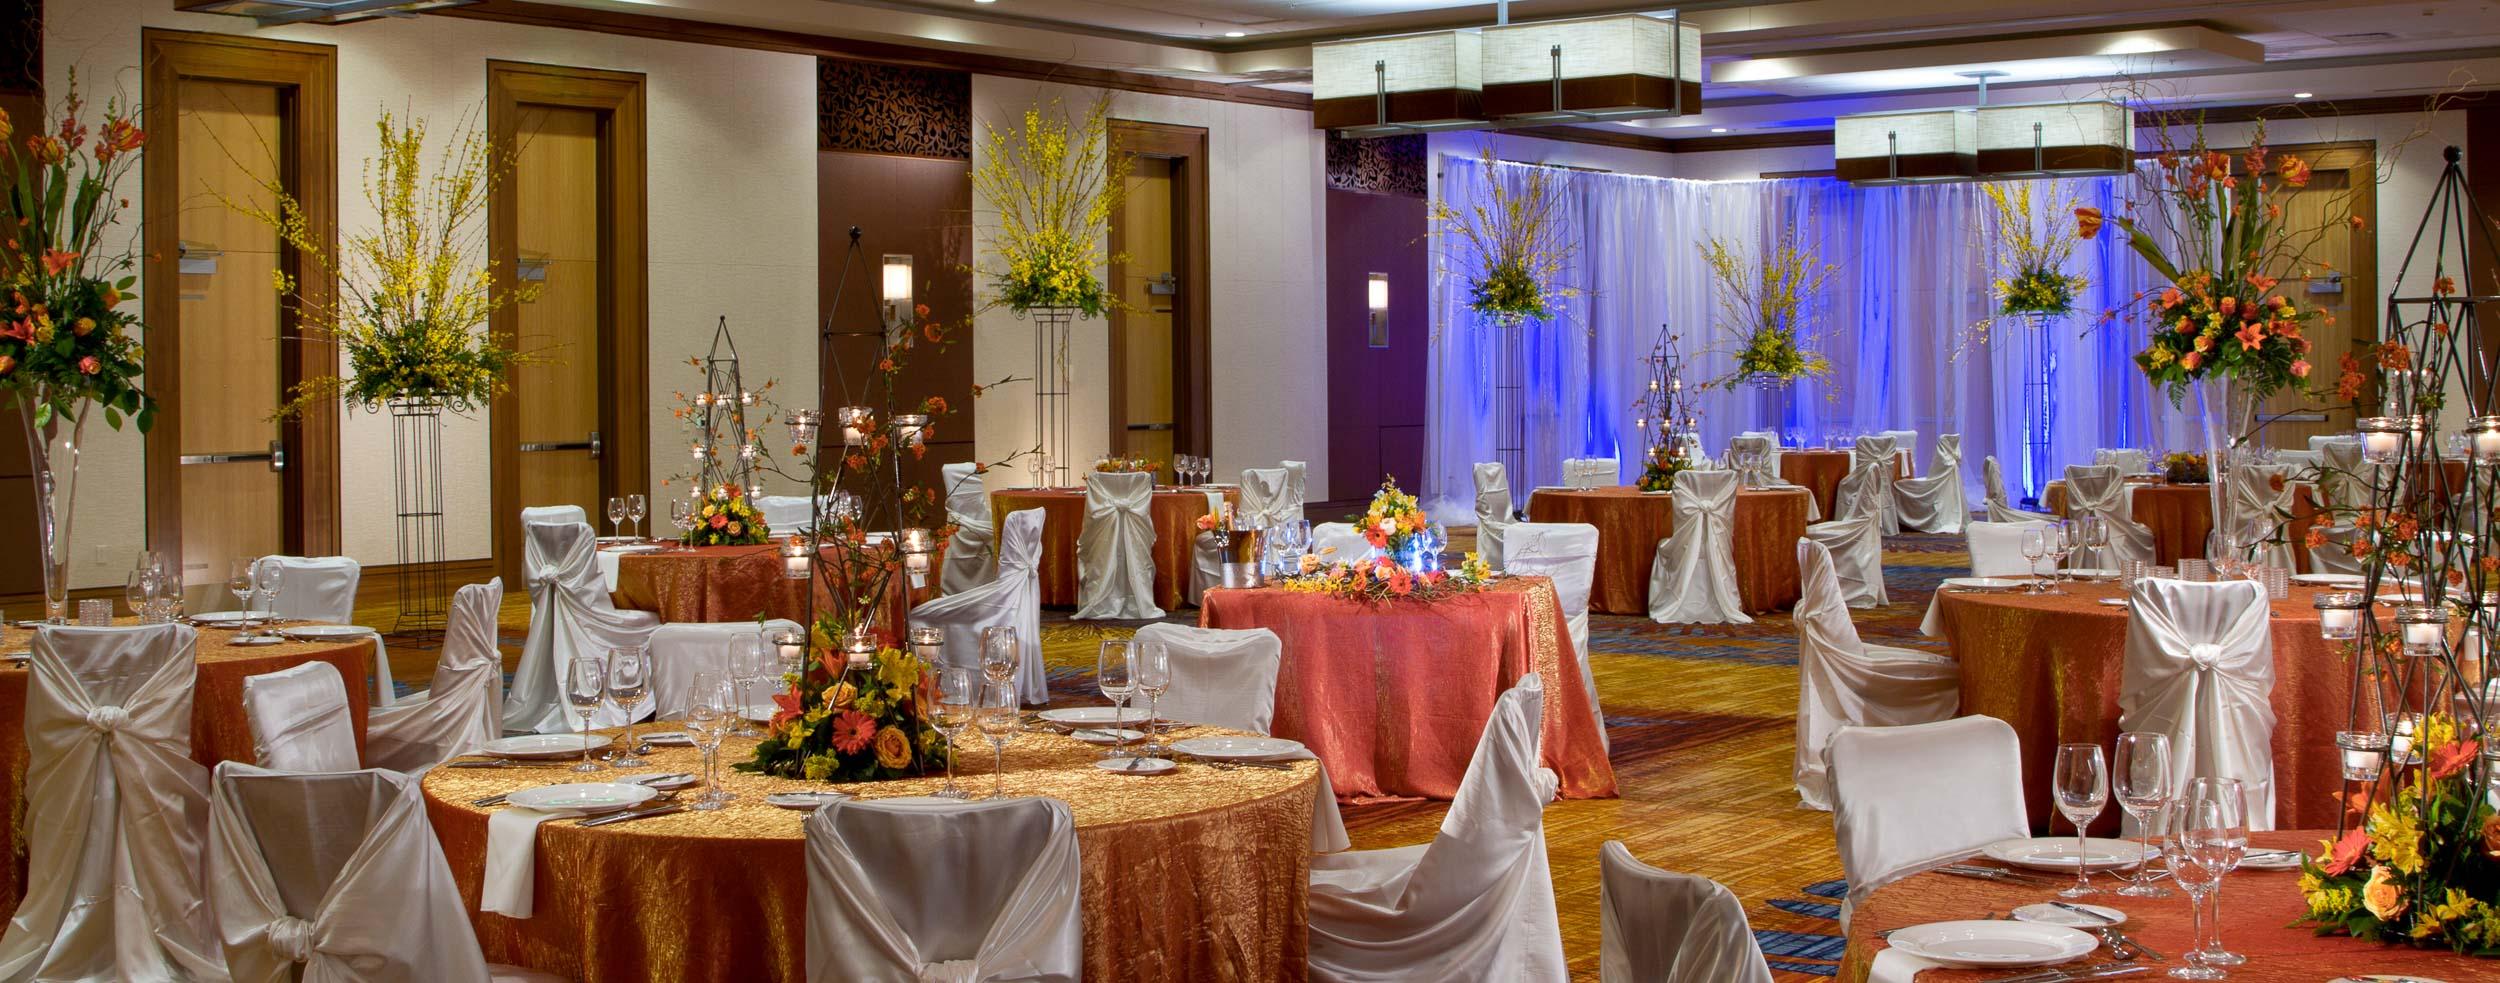 Weddings social events marriott indyplace weddings social events junglespirit Gallery